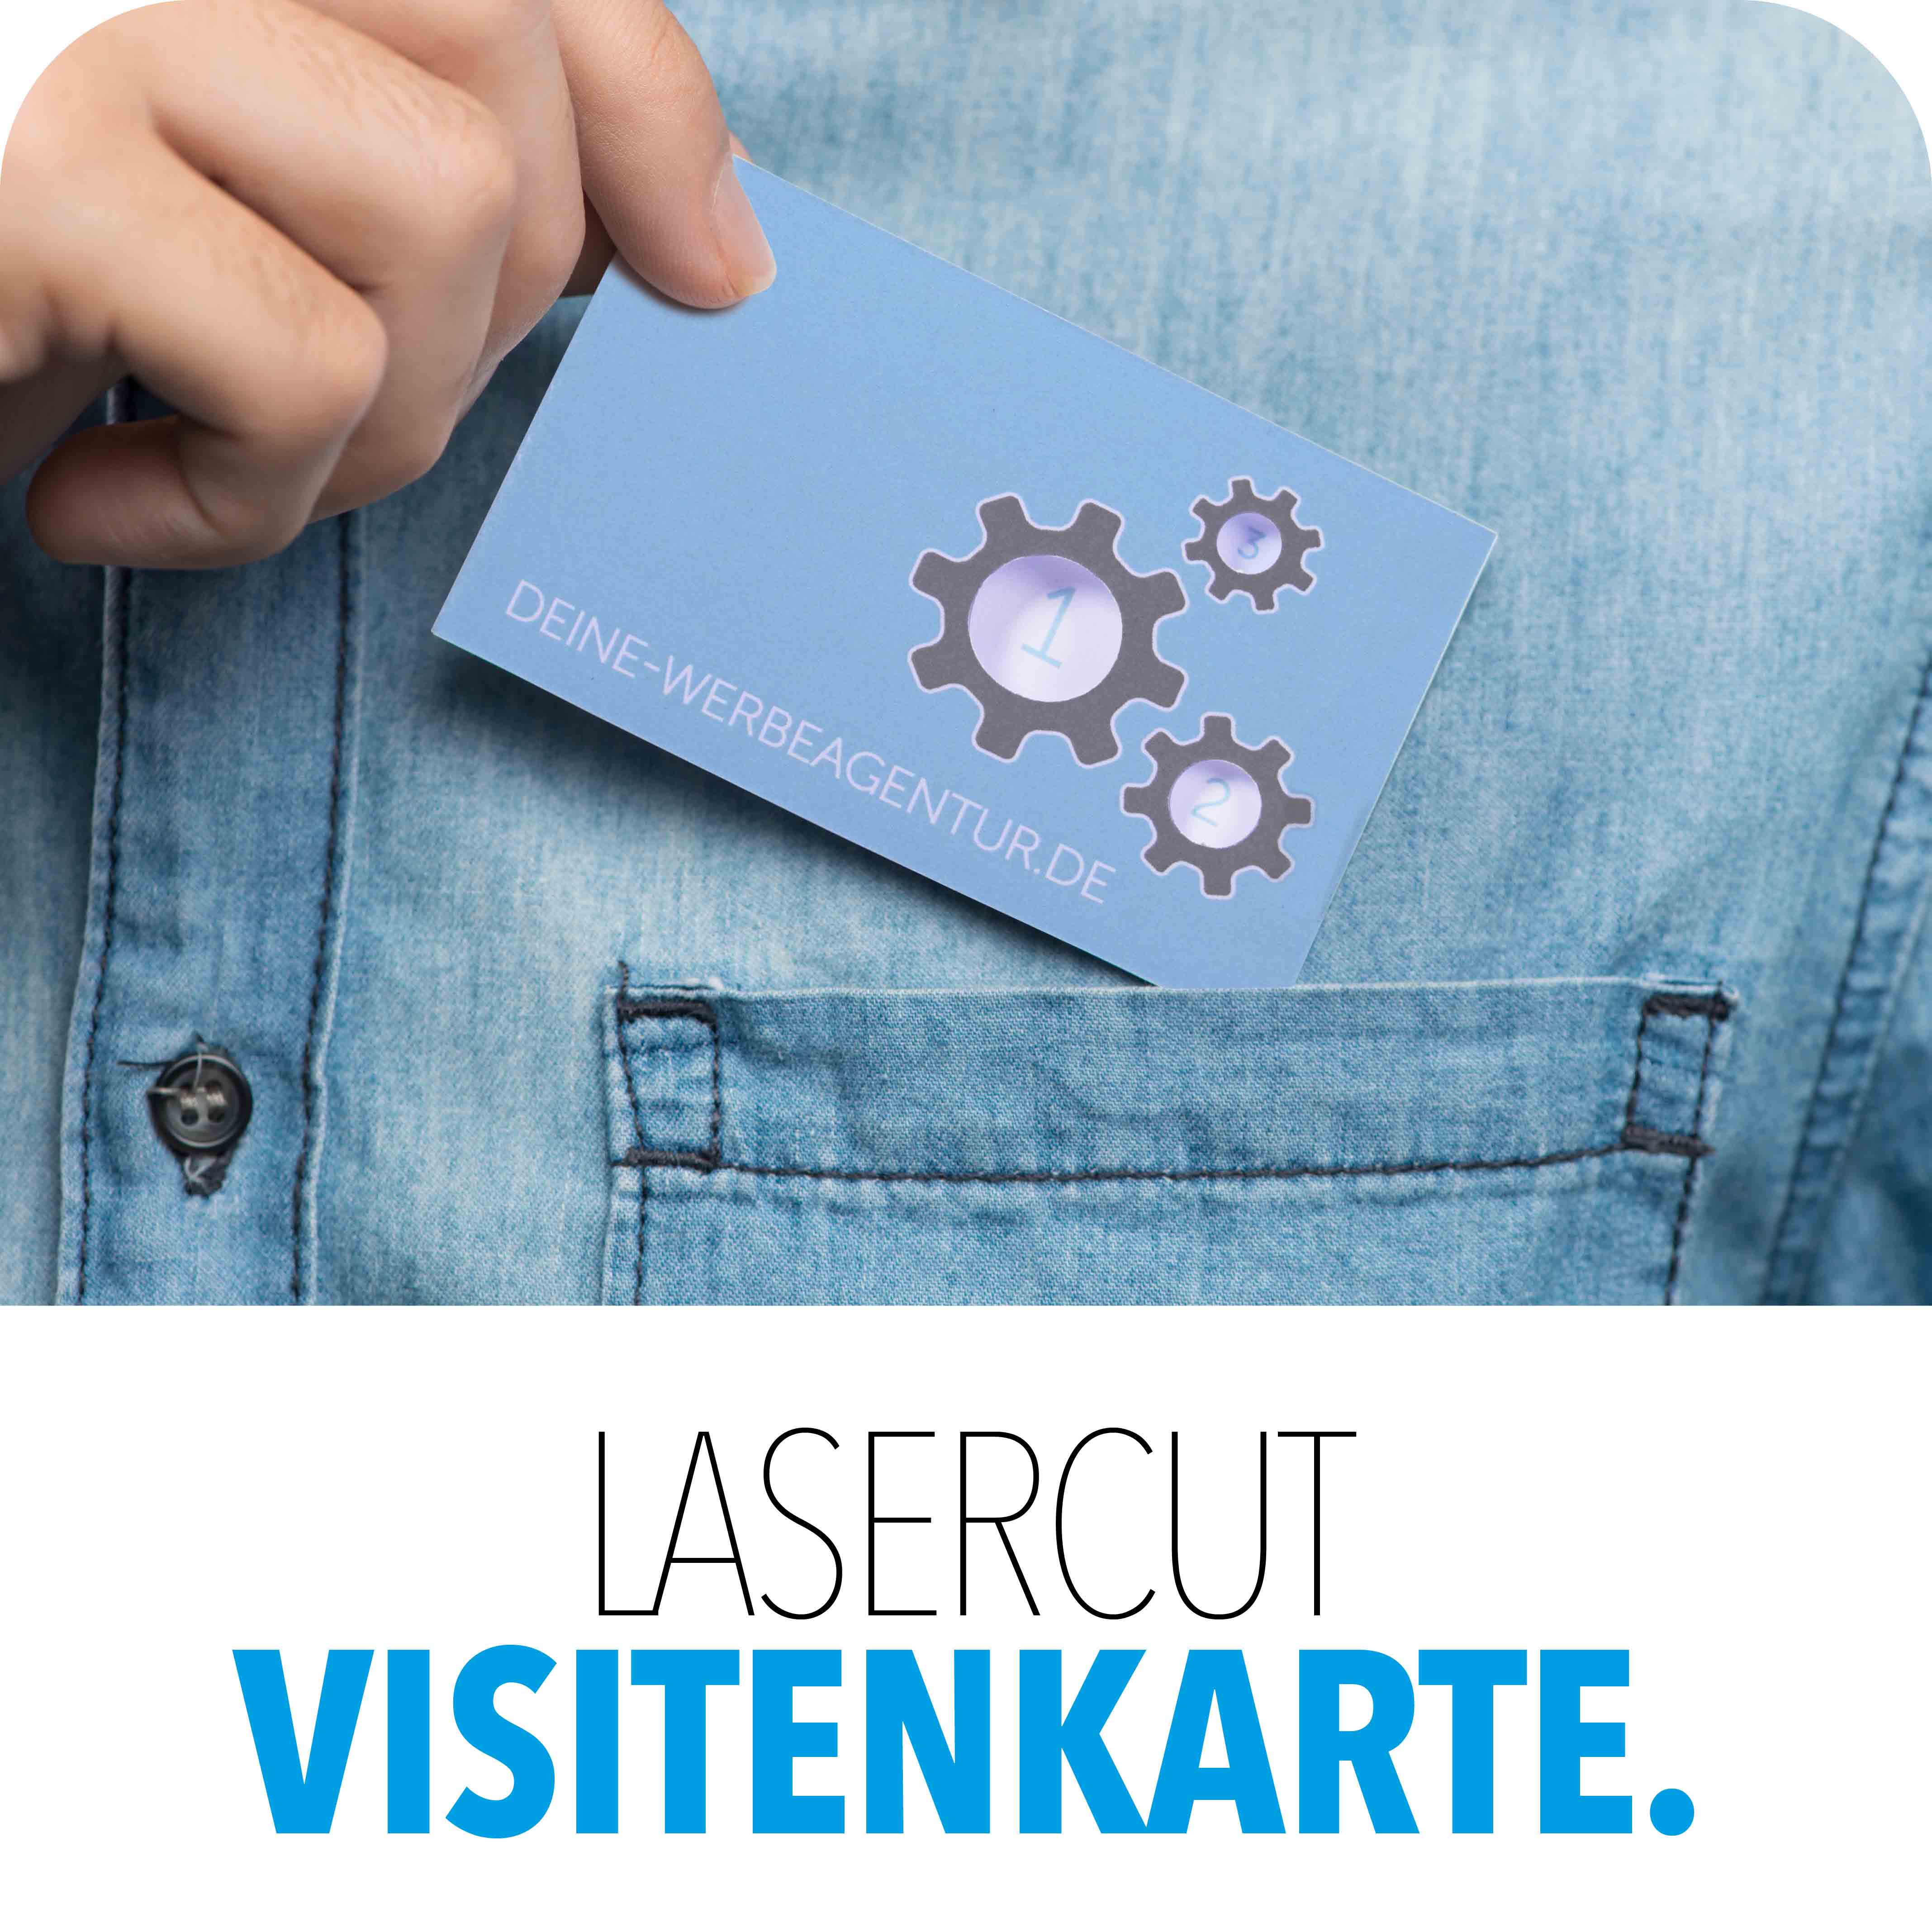 Visitenkarte mit Lasercut